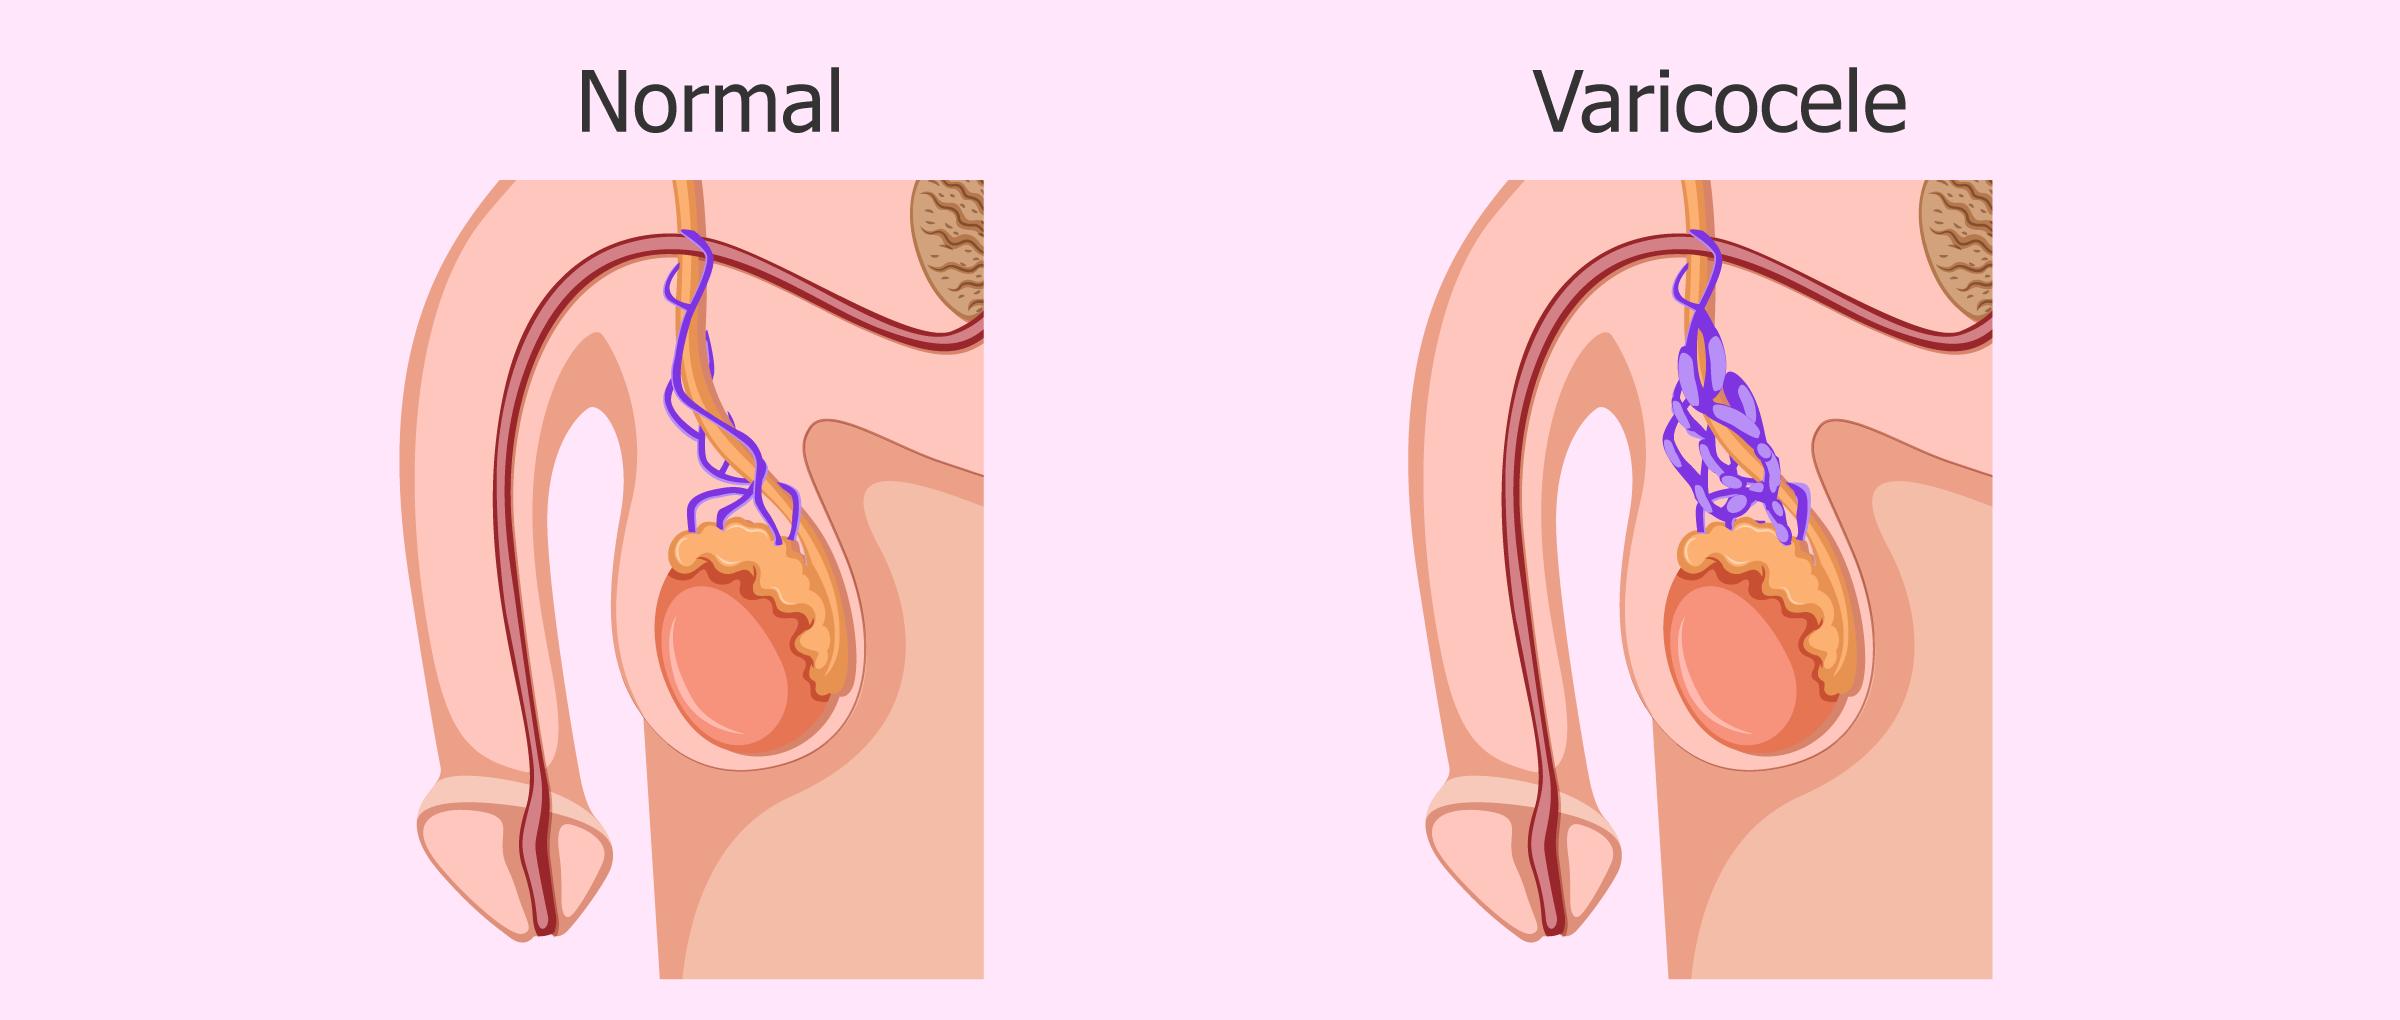 Varicocele can cause azoospermia